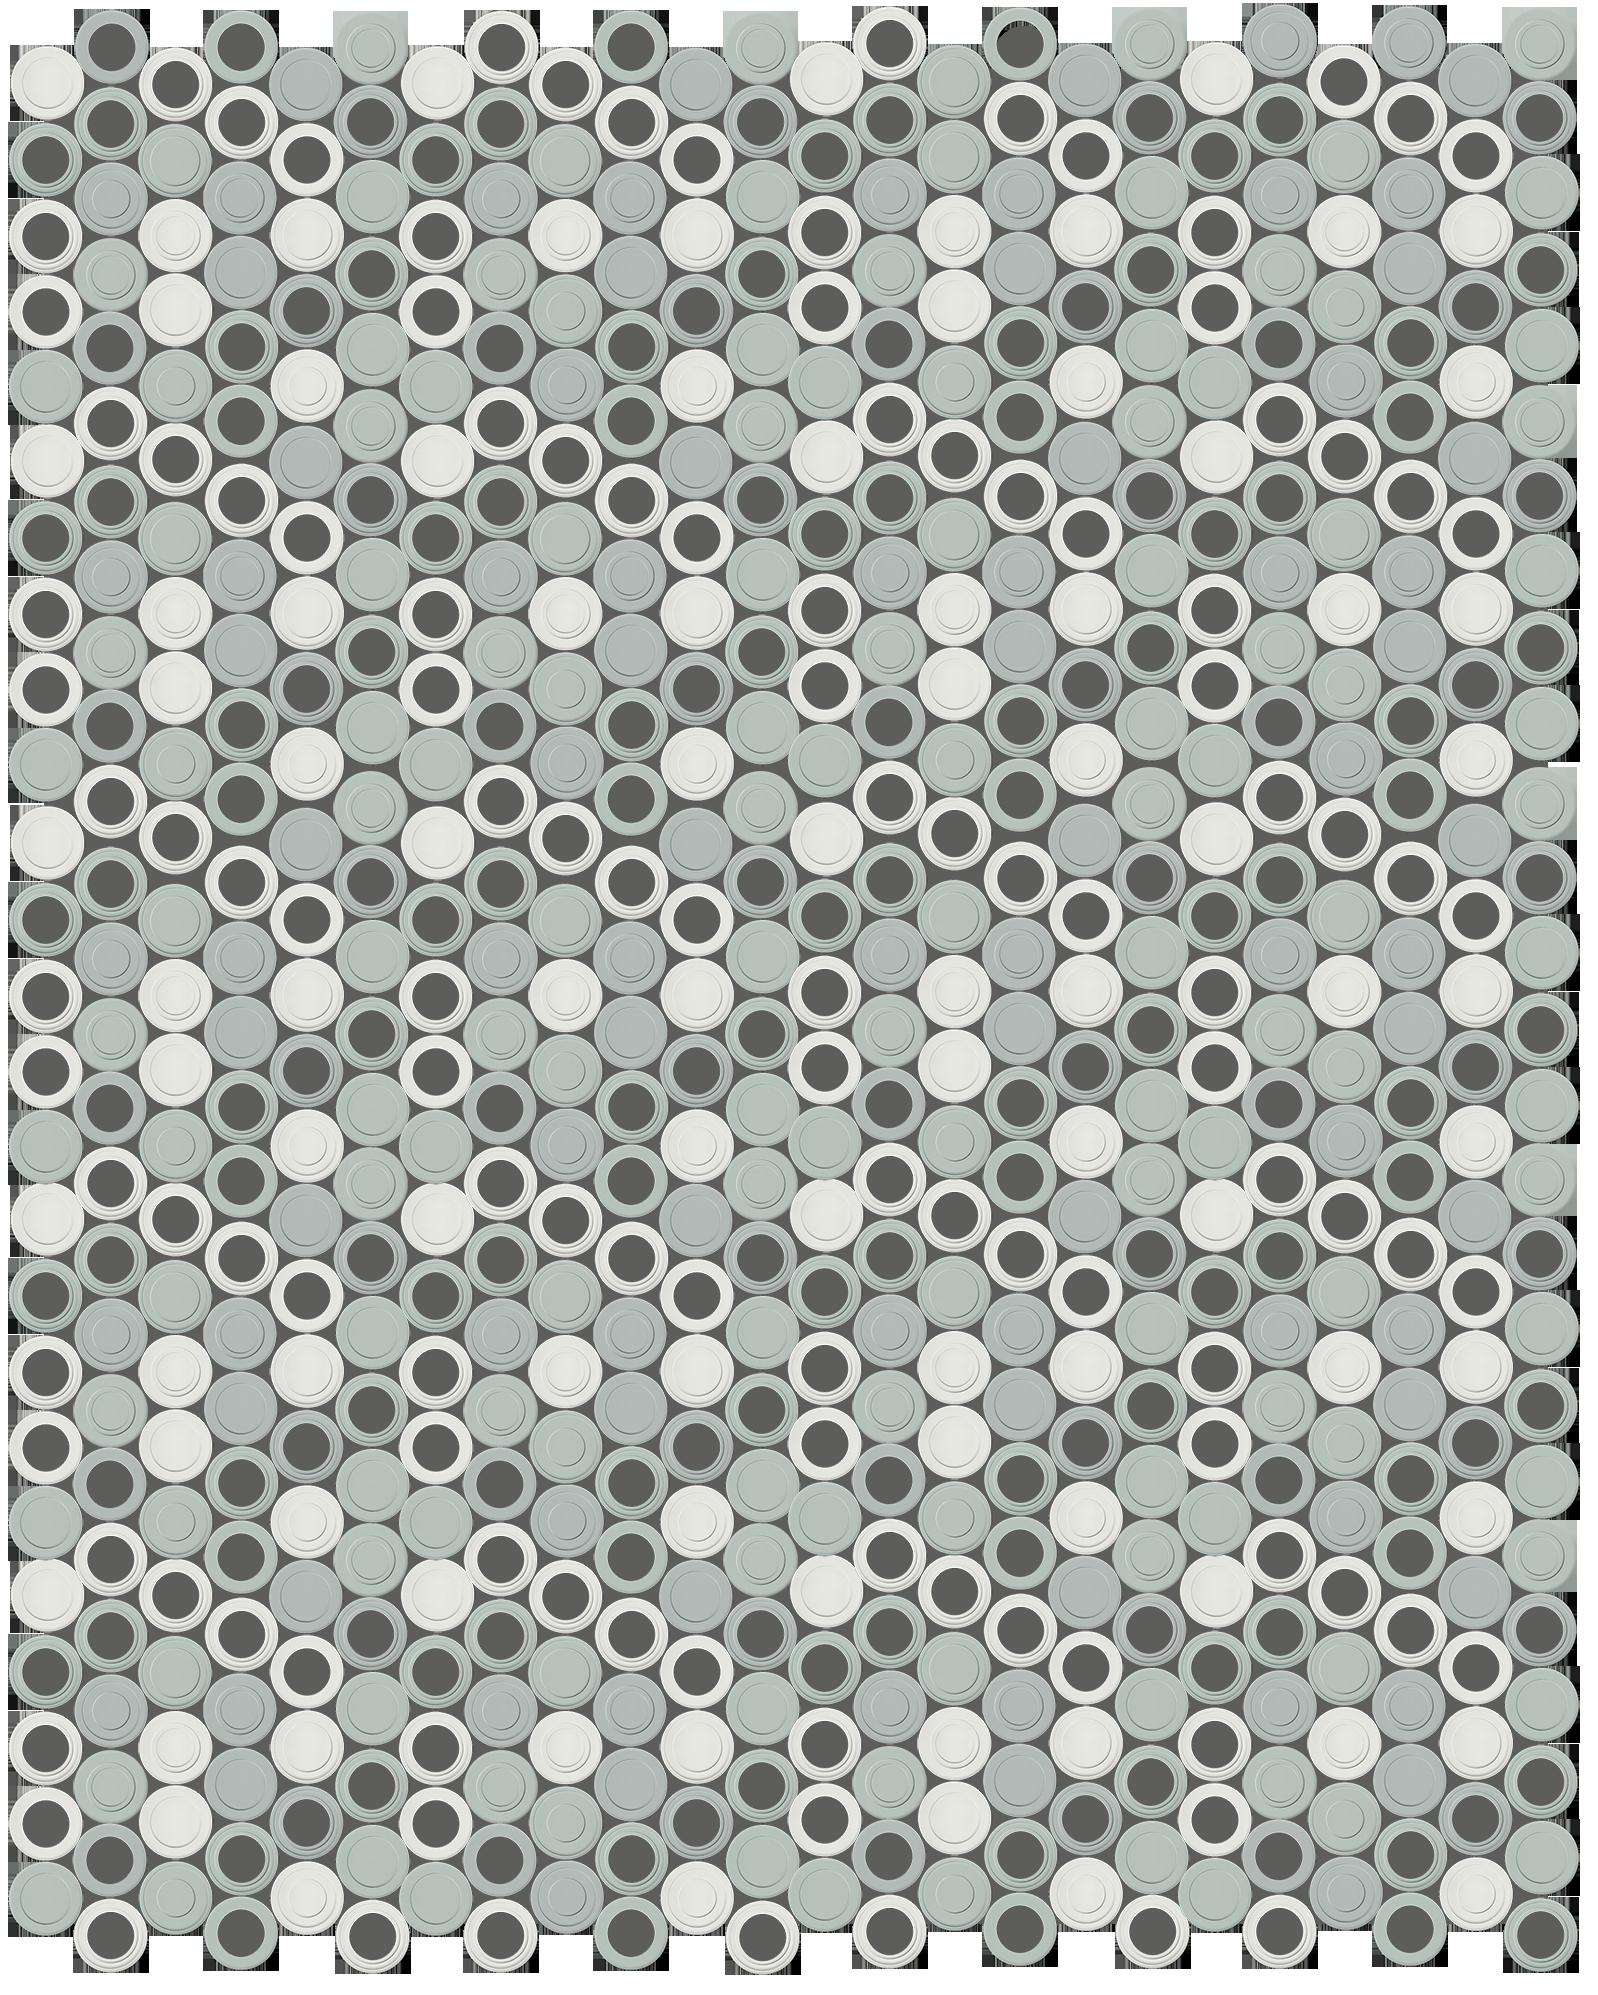 R1-R6 : Pattern F